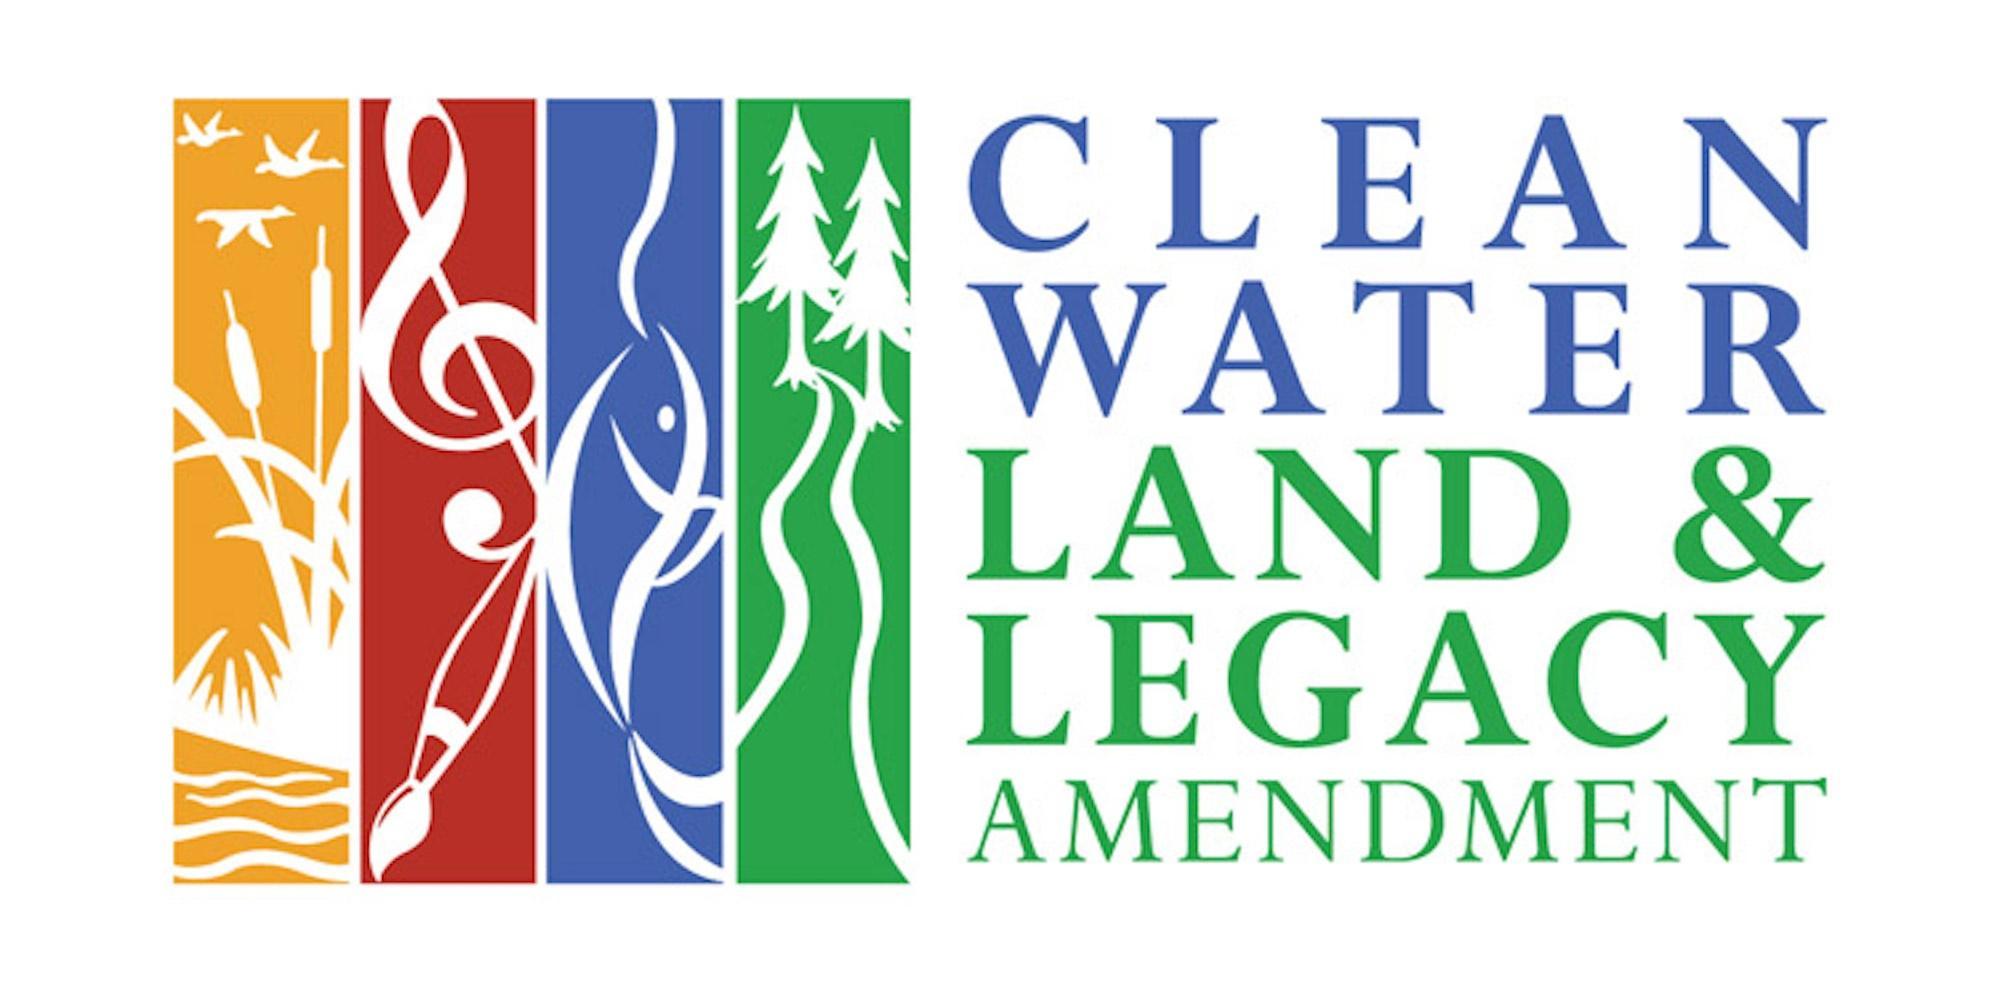 Minnesota Legacy Fund